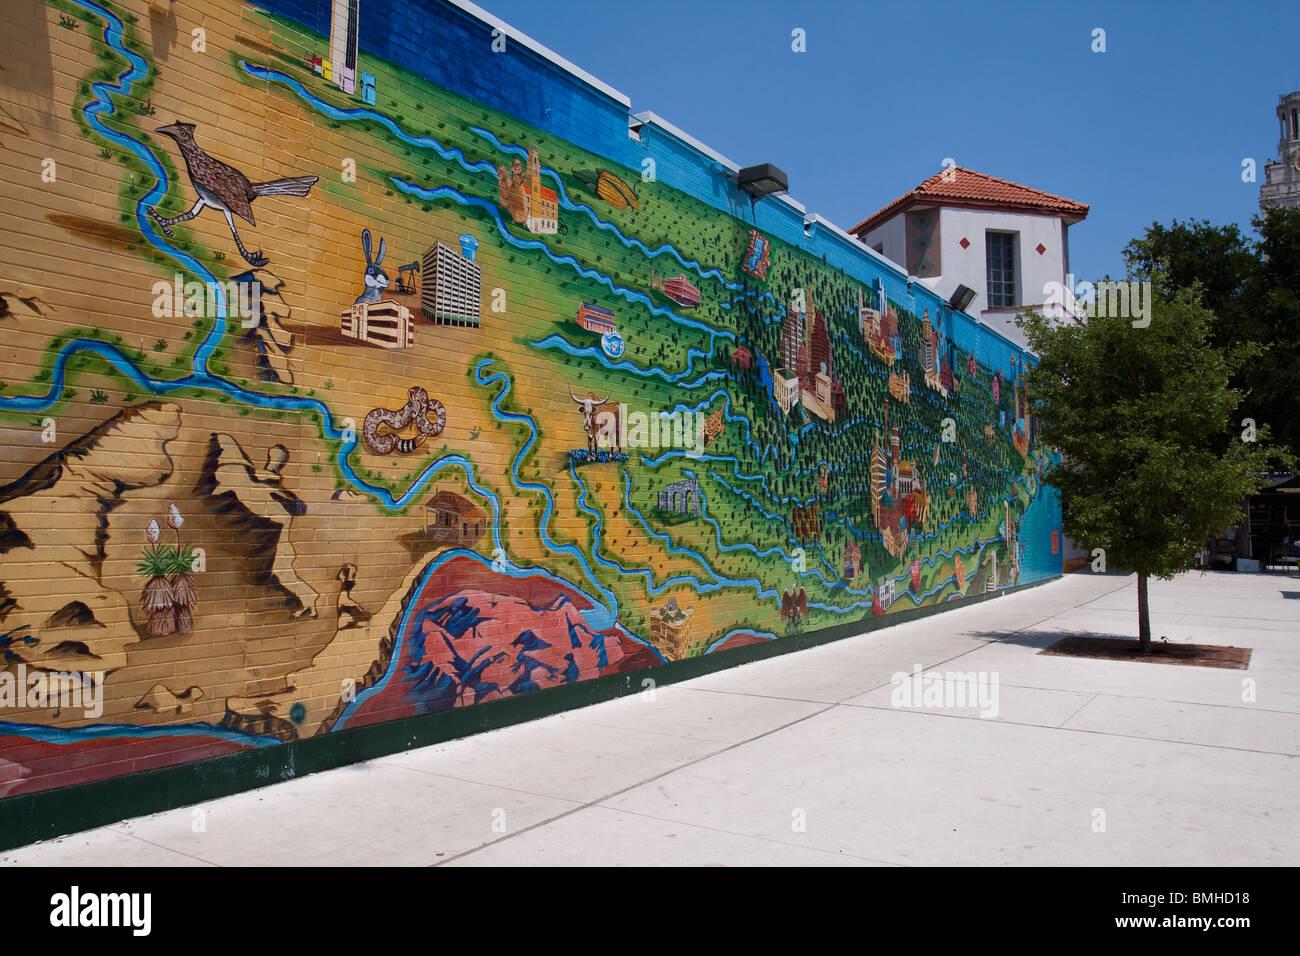 Bunte Wandgemälde im Renaissance Marktplatz entlang der Luftwiderstand an der University of Texas at Austin Stockbild